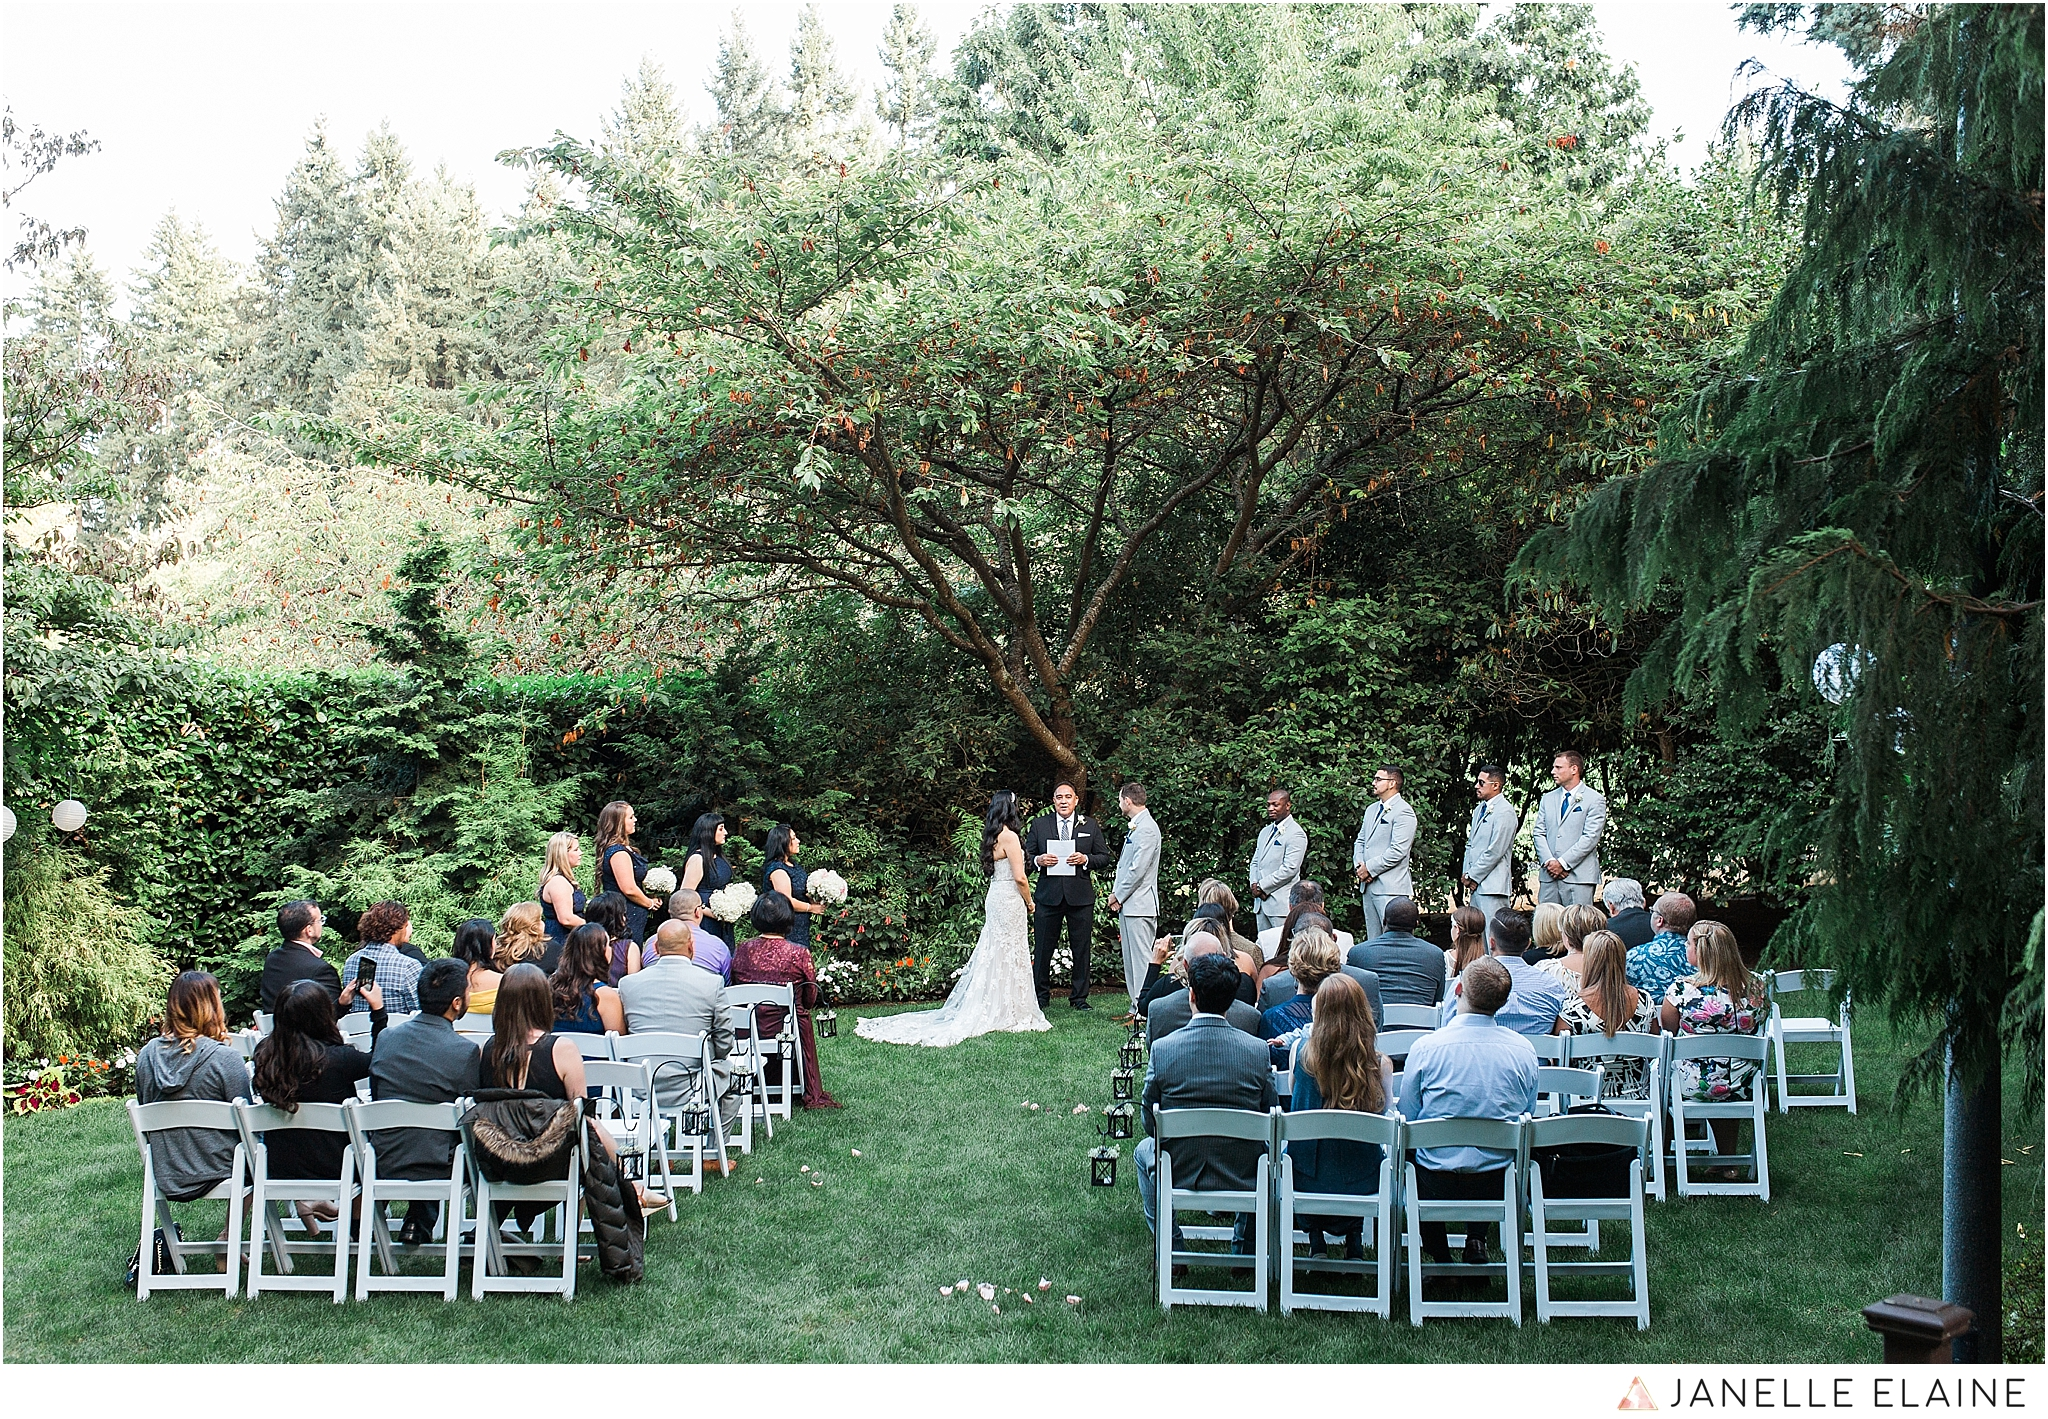 janelle elaine photography-professional wedding photographer-seattle-bellevue-robinswood house-141.jpg